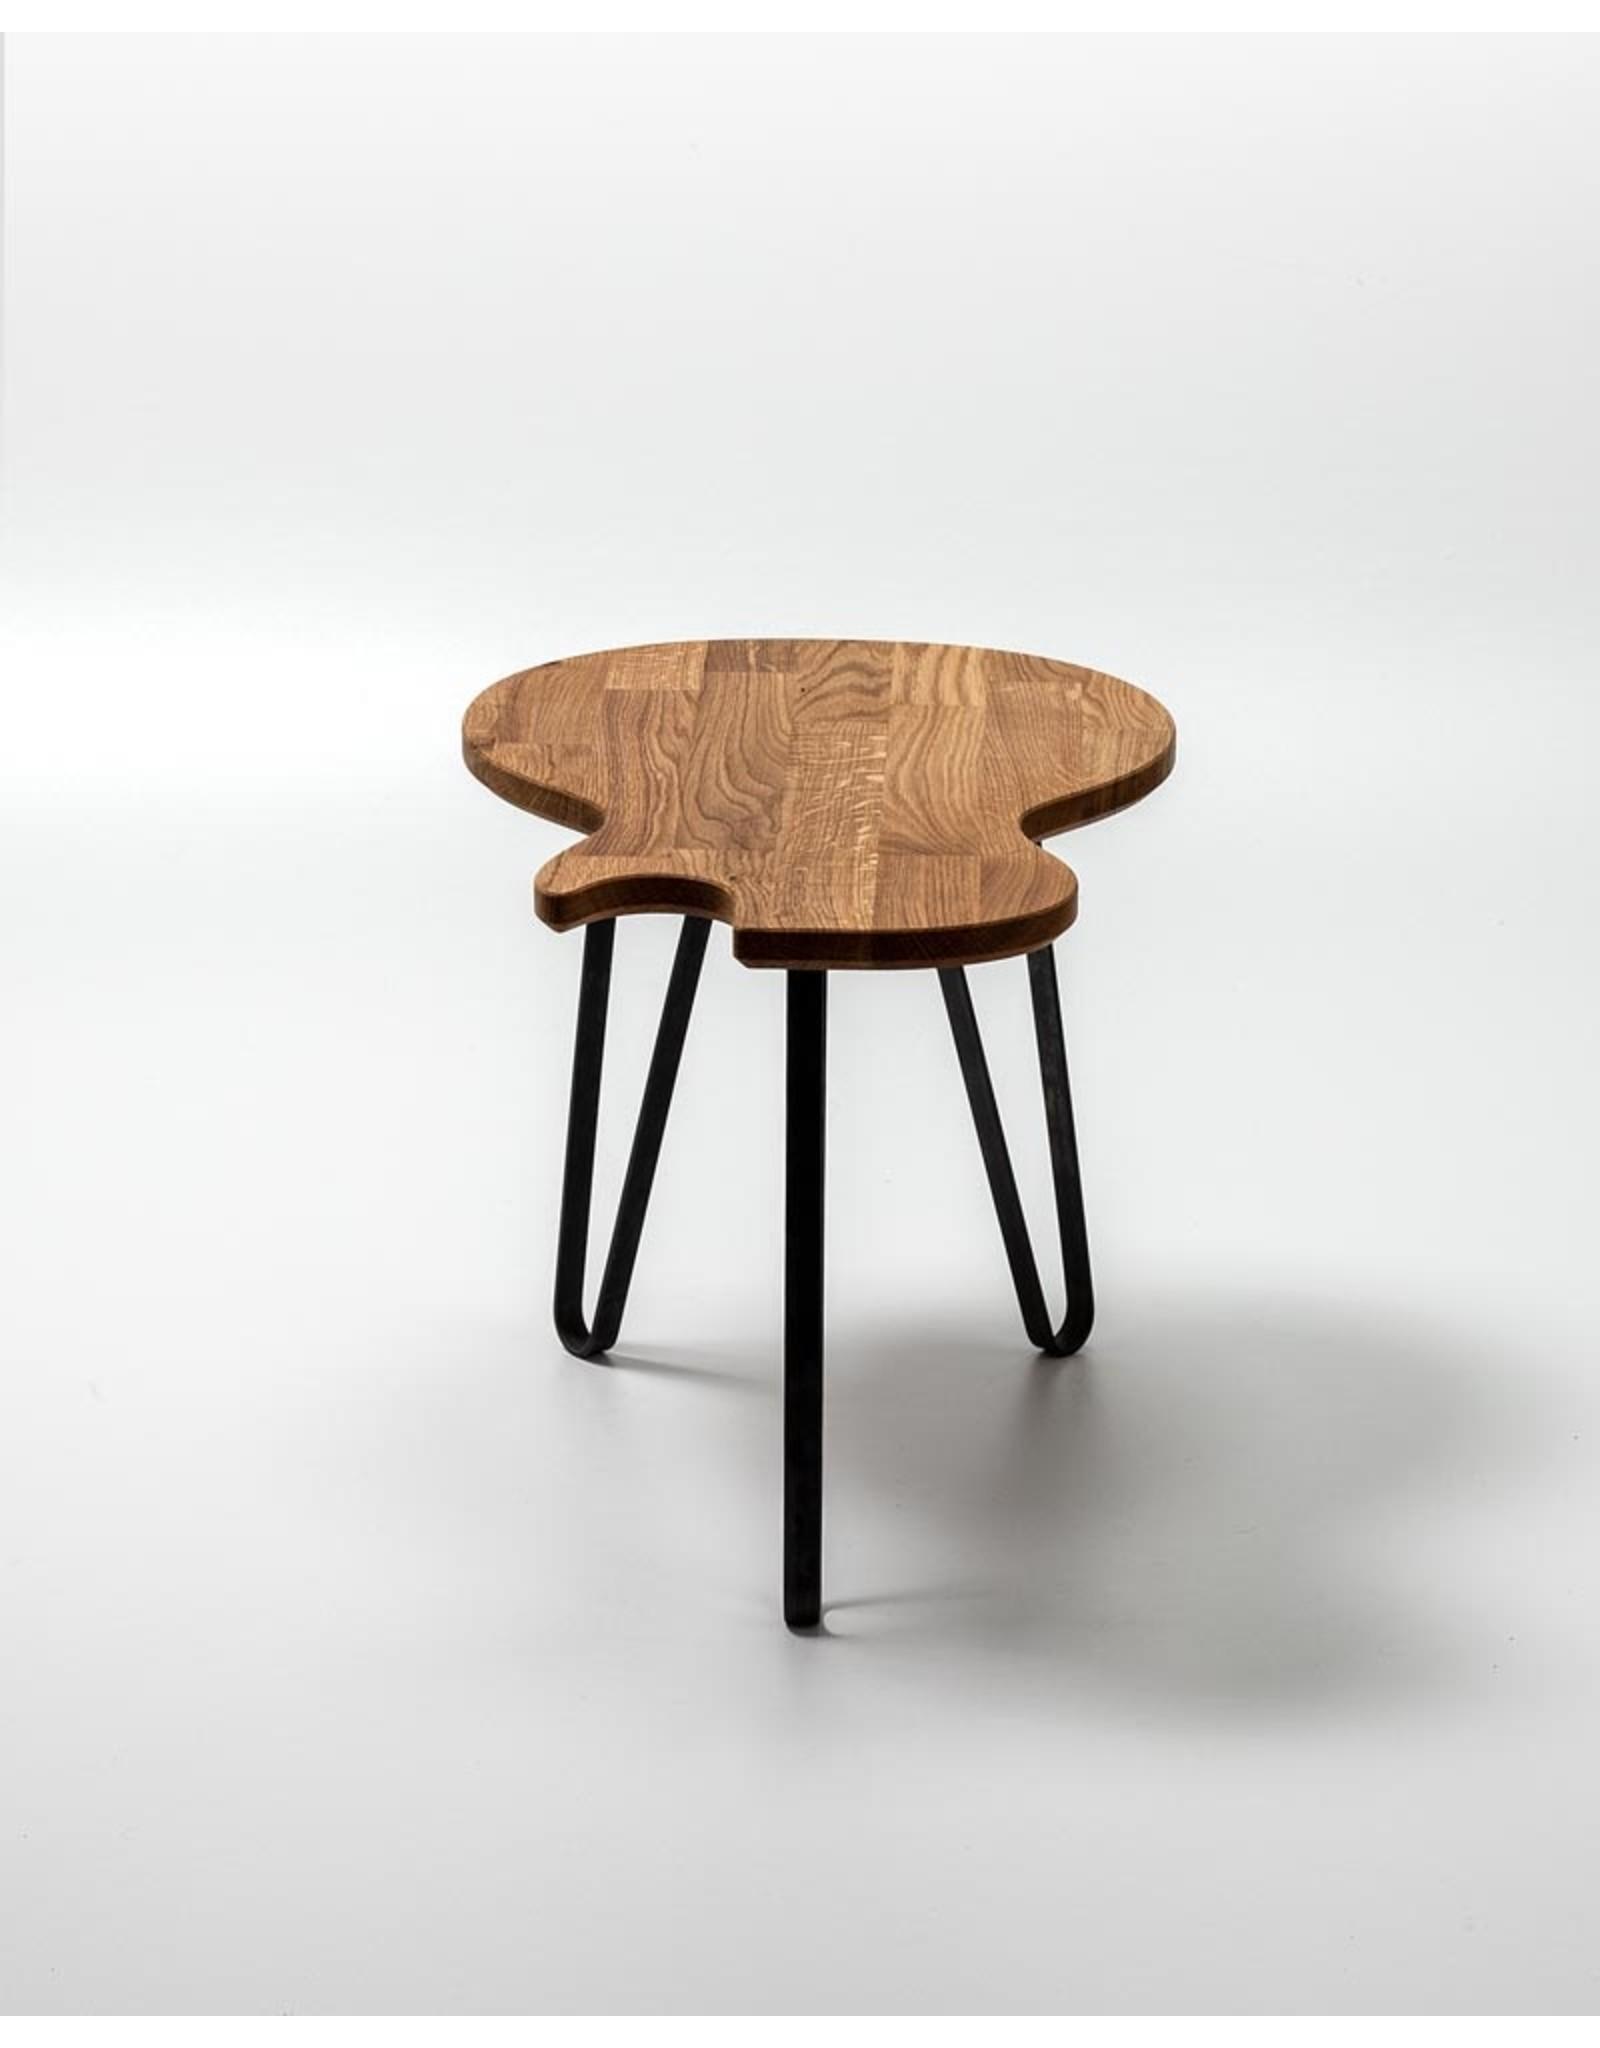 Ruwdesign Ruwdesign Coffee Table Single Cut